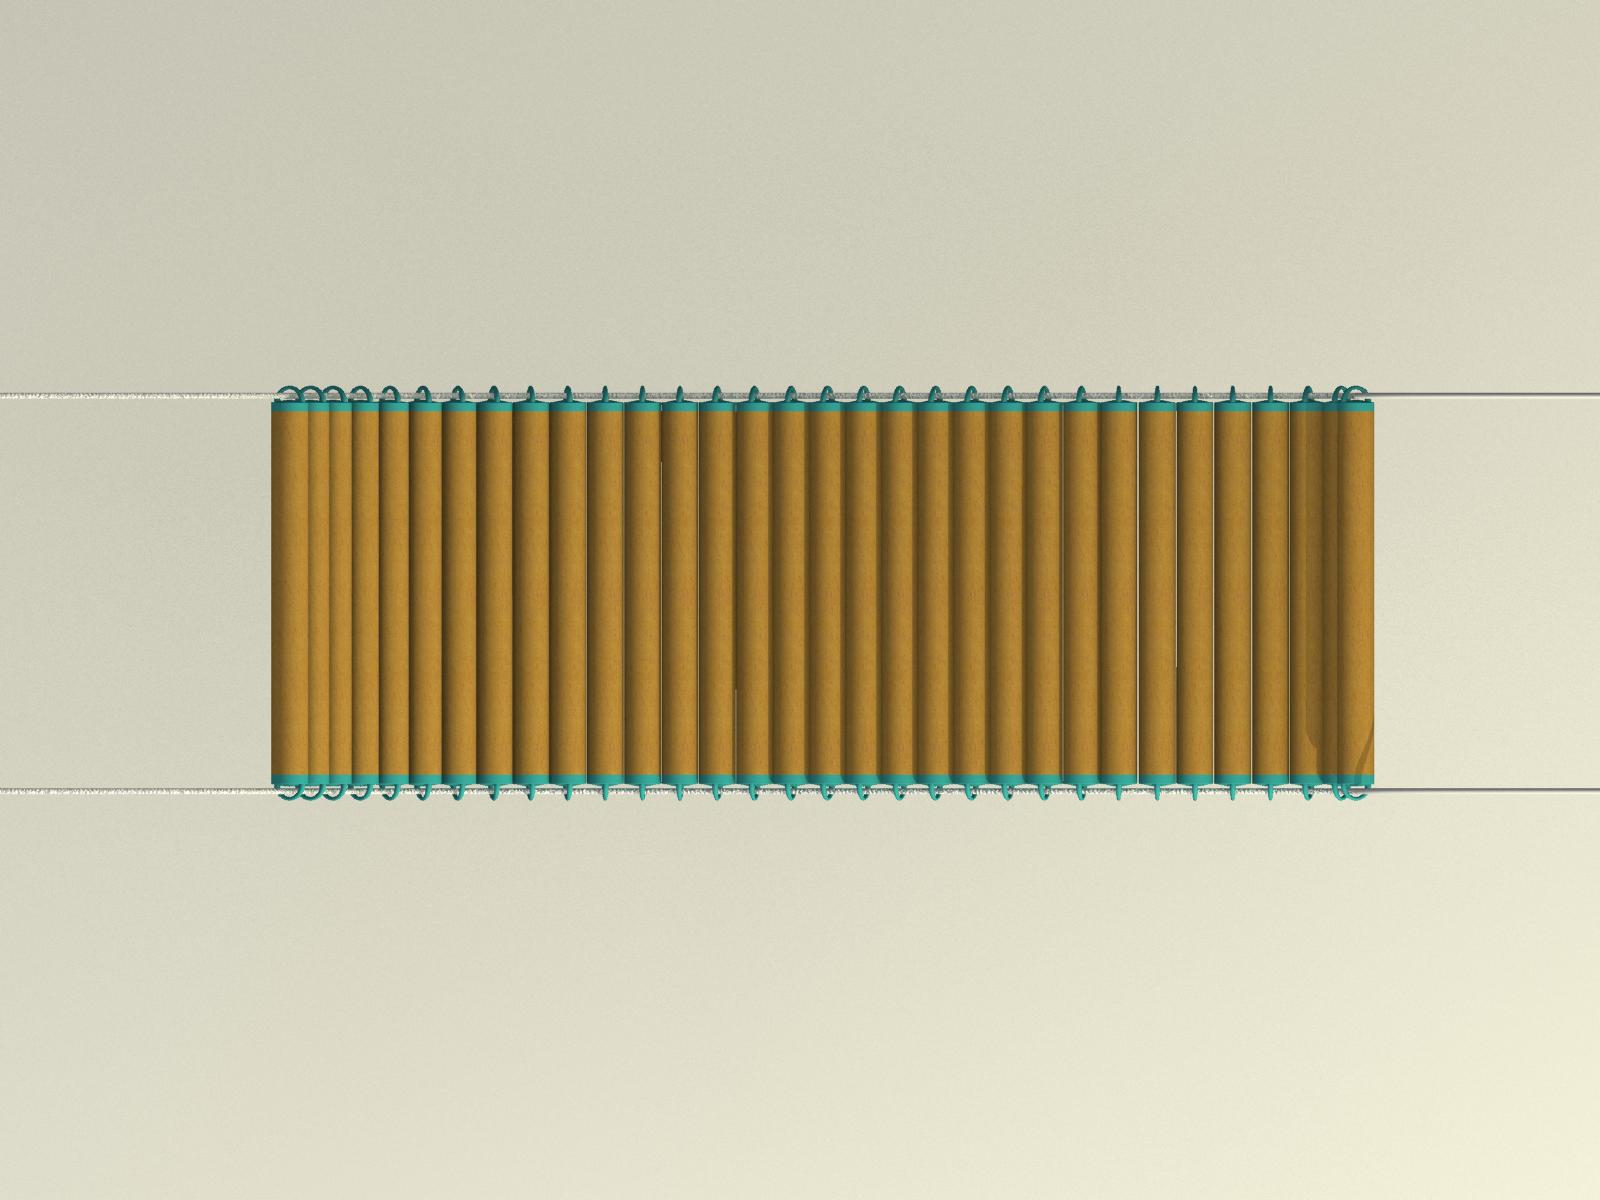 HAMMOCK_2.png Download free STL file HAMMOCK • 3D printing template, TED3D